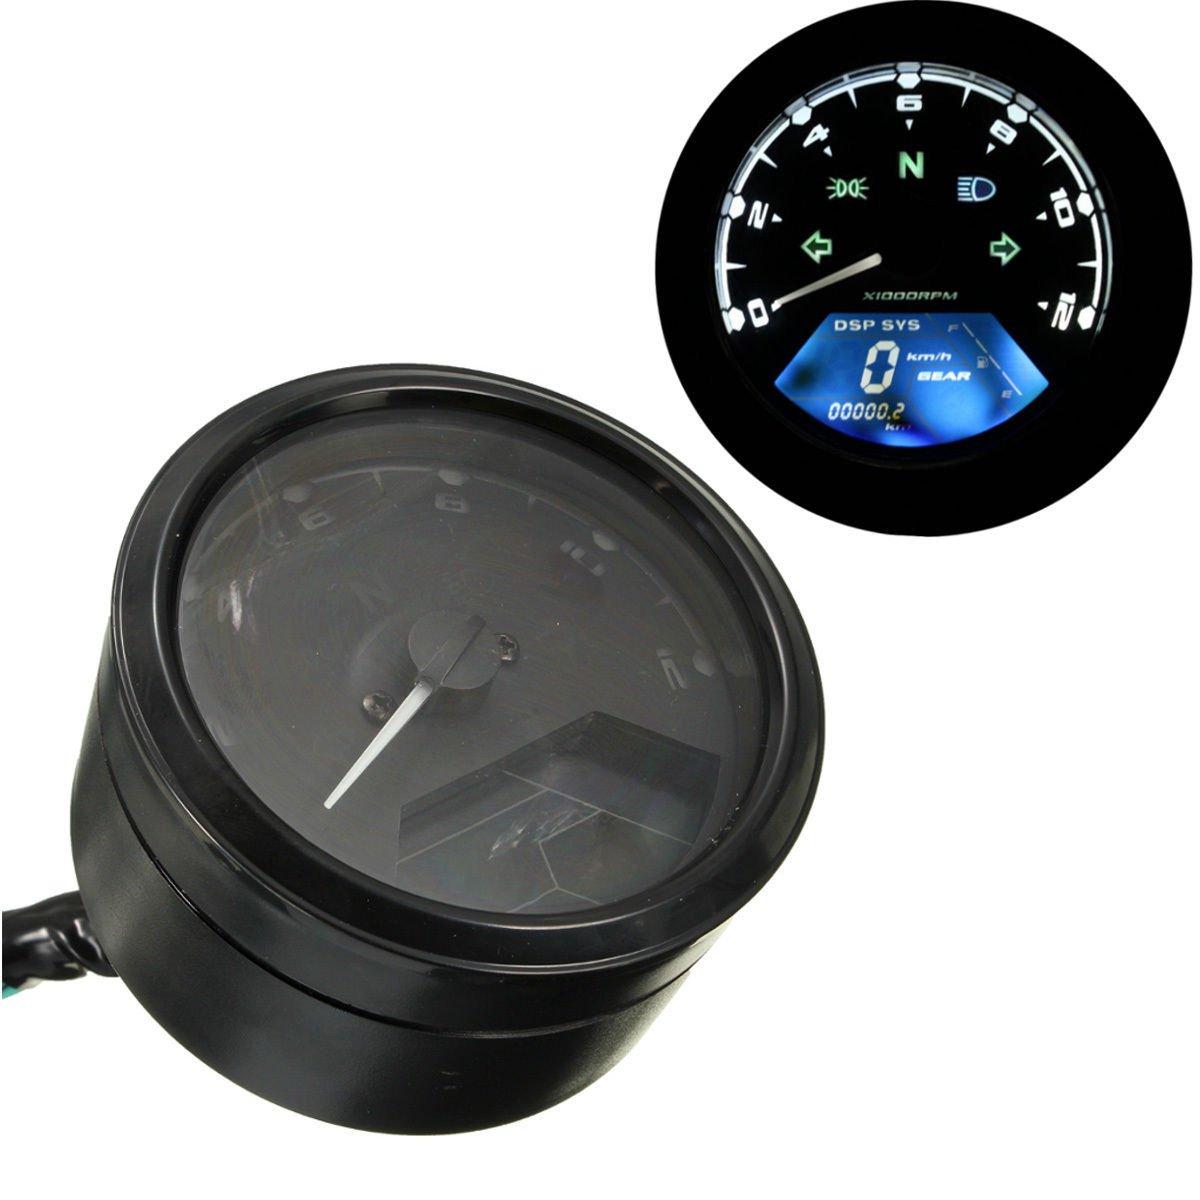 12000RPM LCD Digital Odometer Speedometer Tachometer F1 2 4 Cylinders Motorcycle db